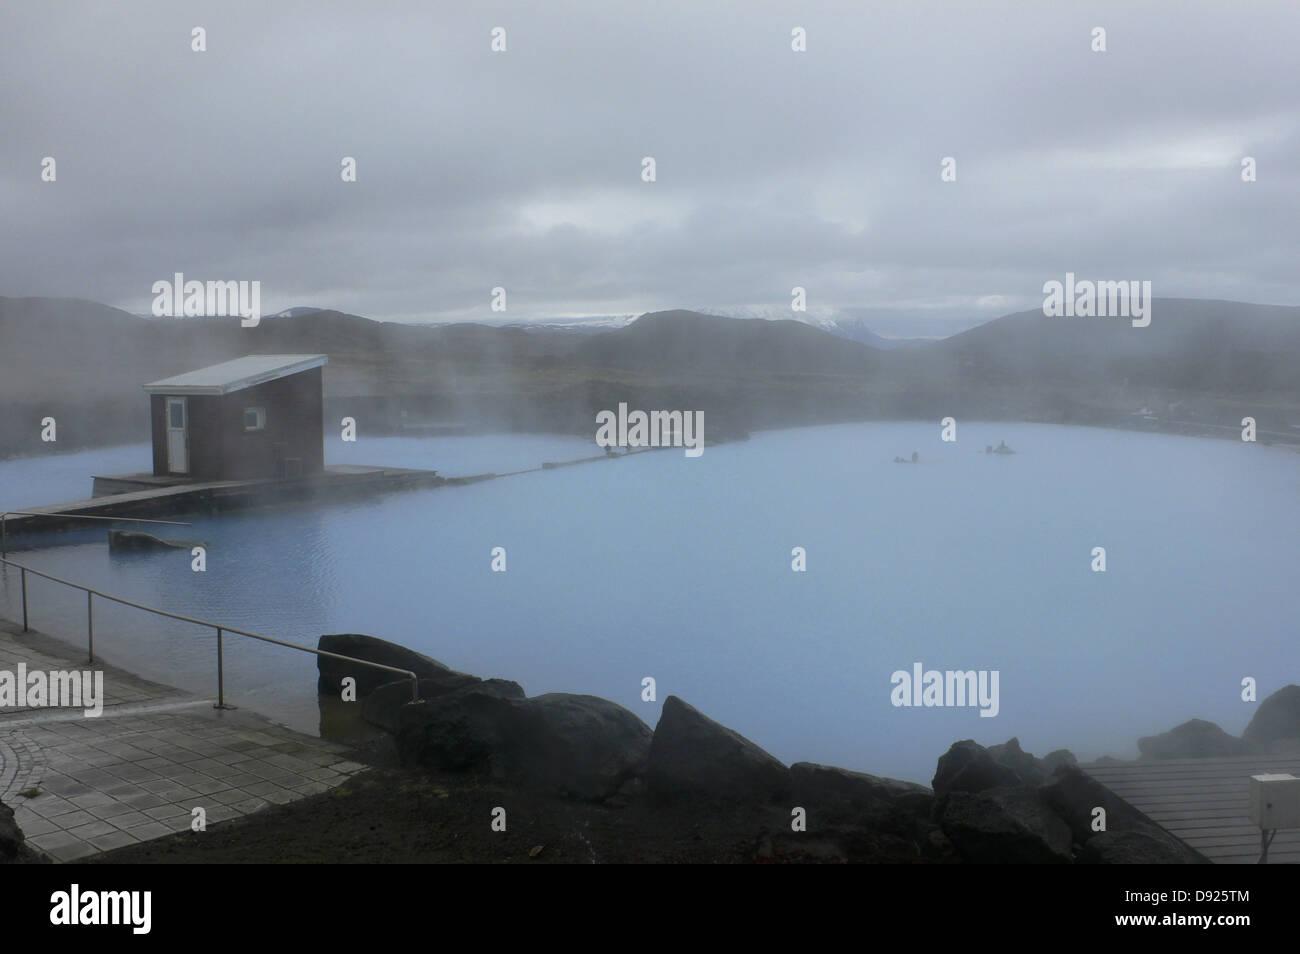 Thermal bath, Mývatn, Northeast Iceland, Iceland - Stock Image